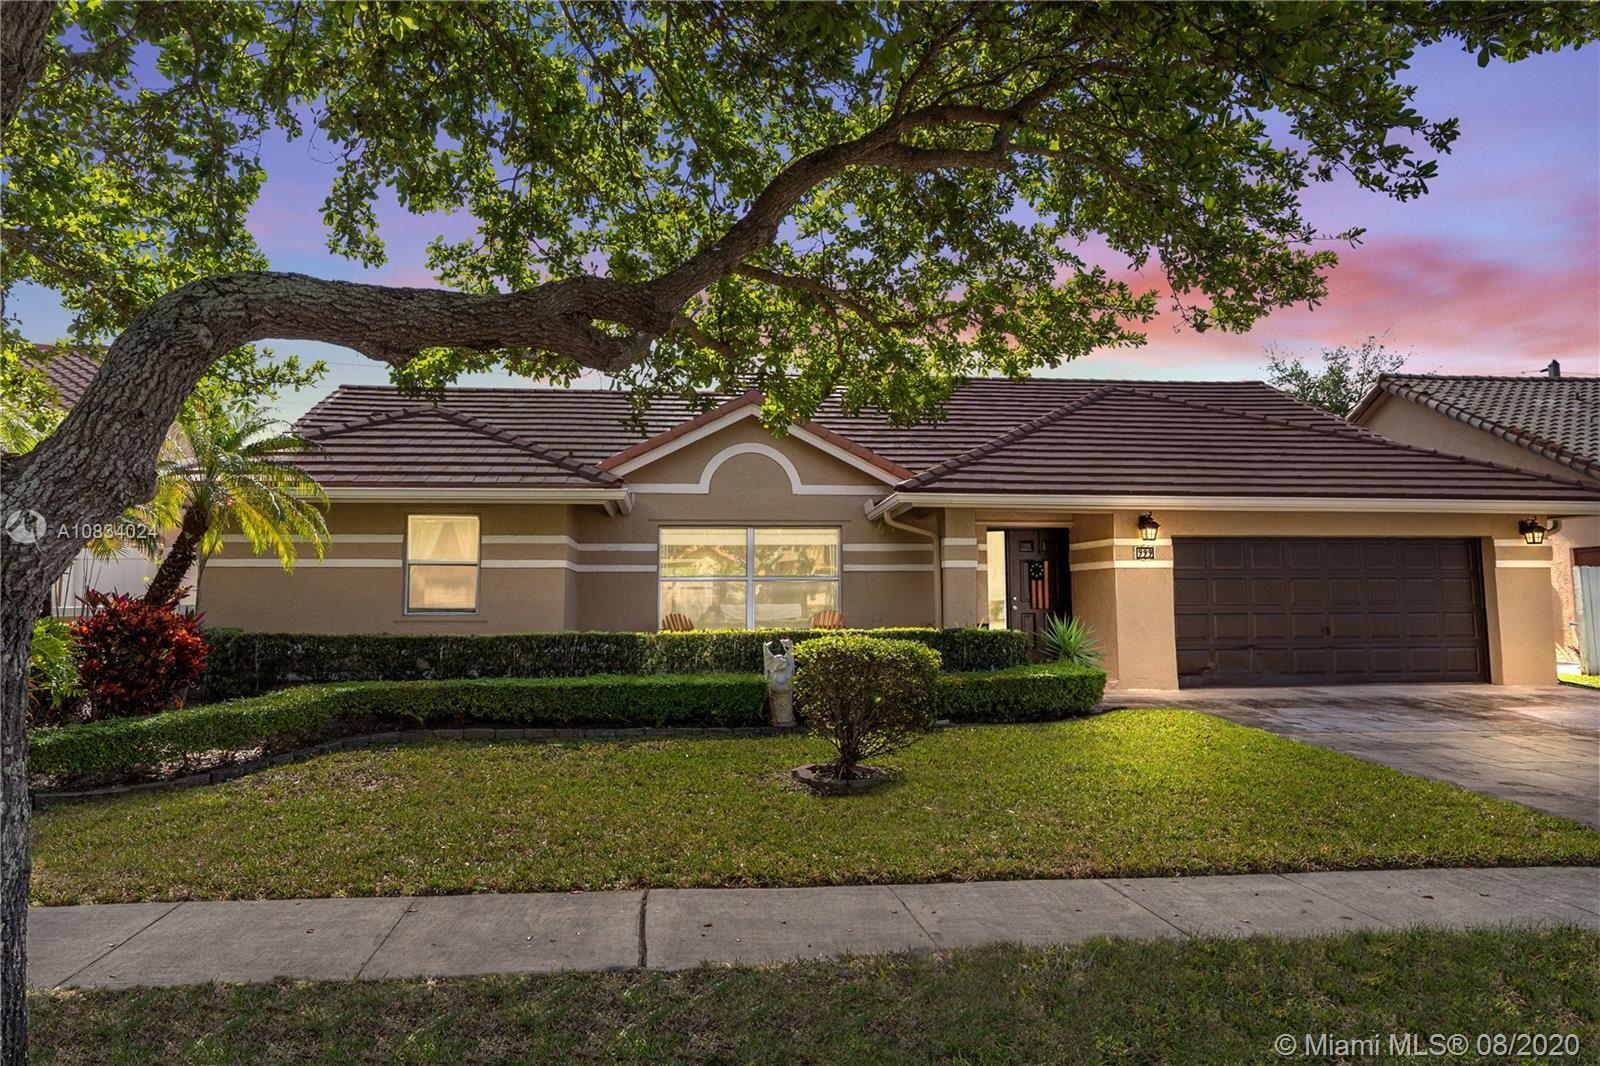 999 NW 161st Ave, Pembroke Pines, FL 33028 - MLS#: A10834024